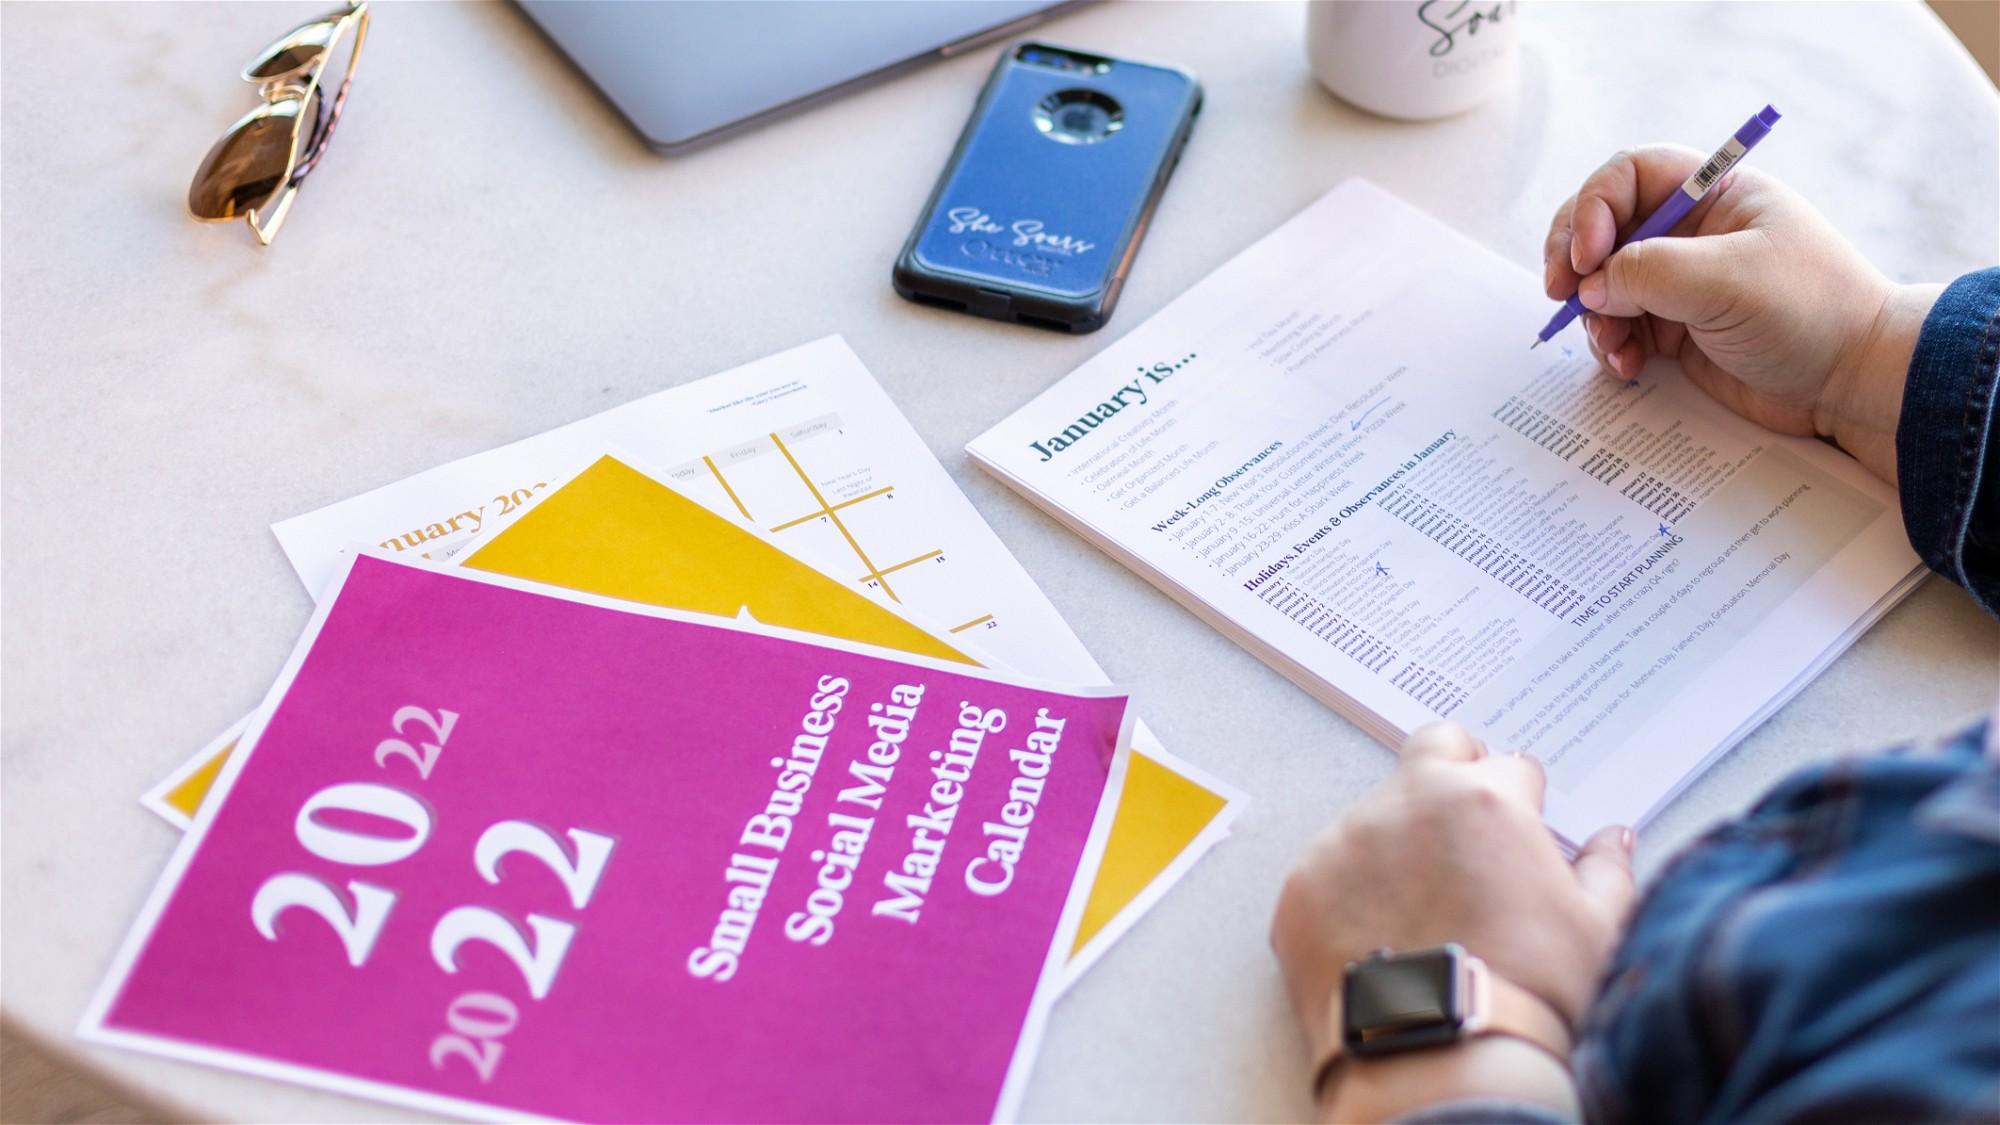 AppSumo Deal for 2022 Small Business Social Media Marketing Planner